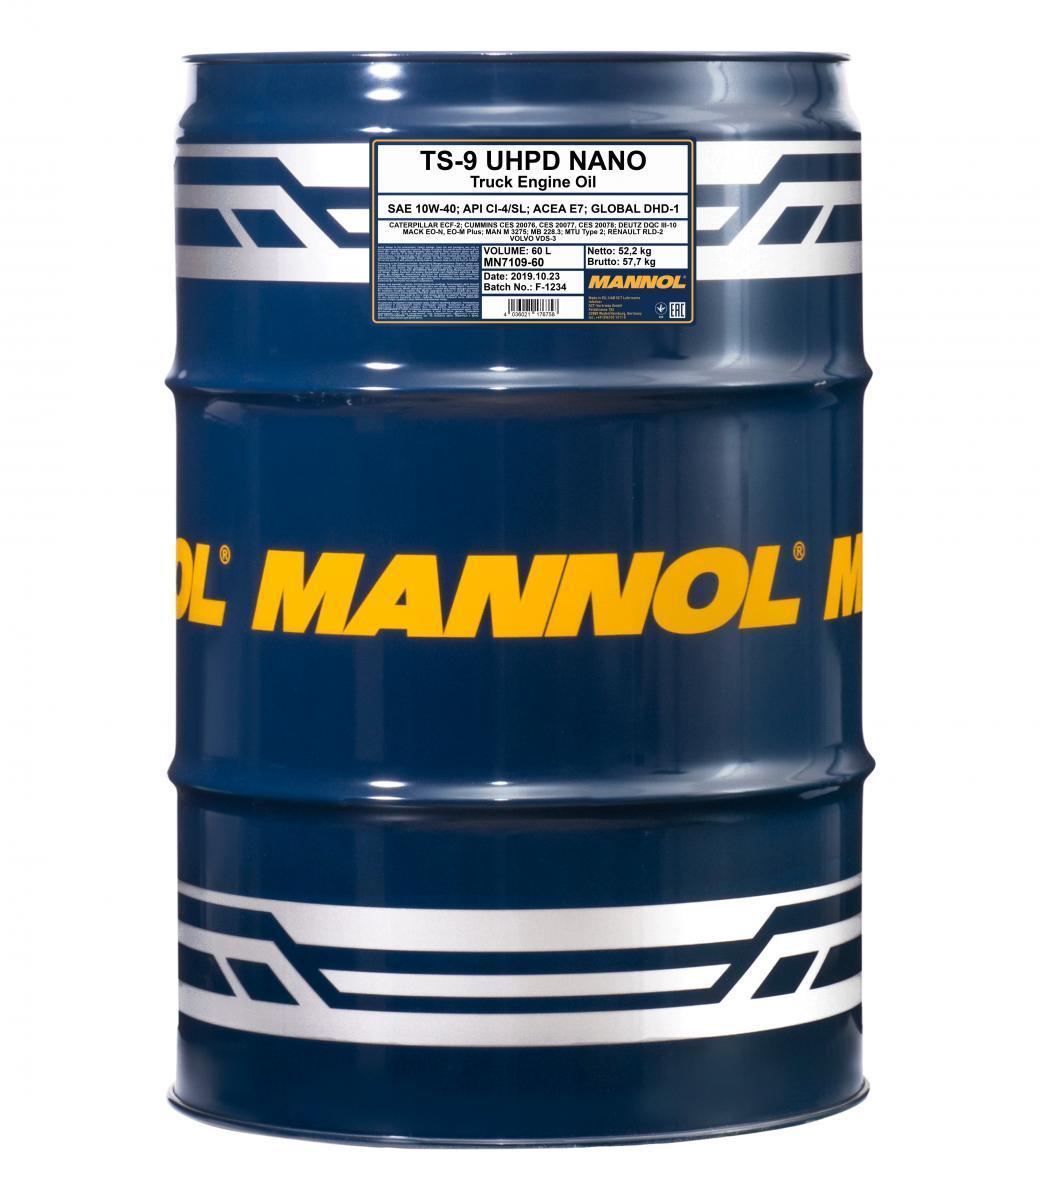 MN7109-60 MANNOL TS-9, UHPD Nano 10W-40, 60l, Teilsynthetiköl Motoröl MN7109-60 günstig kaufen